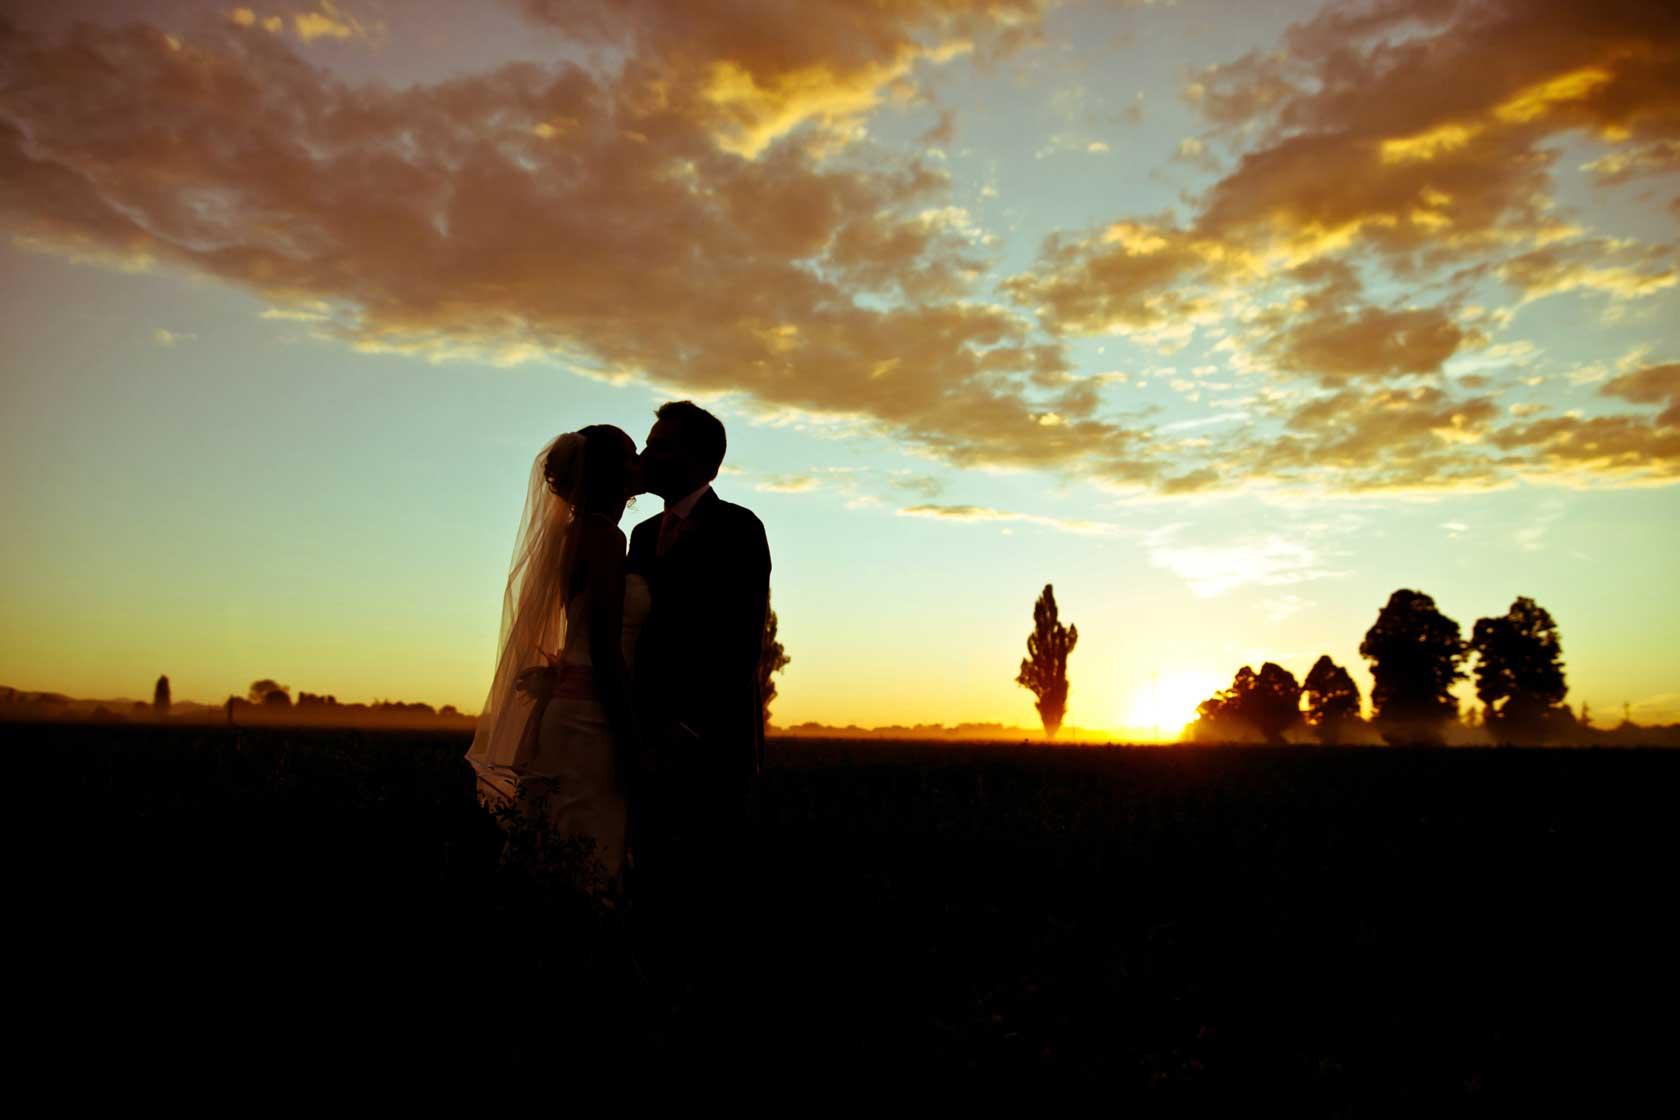 Matrimonio In Economia : Spese del matrimonio risparmiare si può